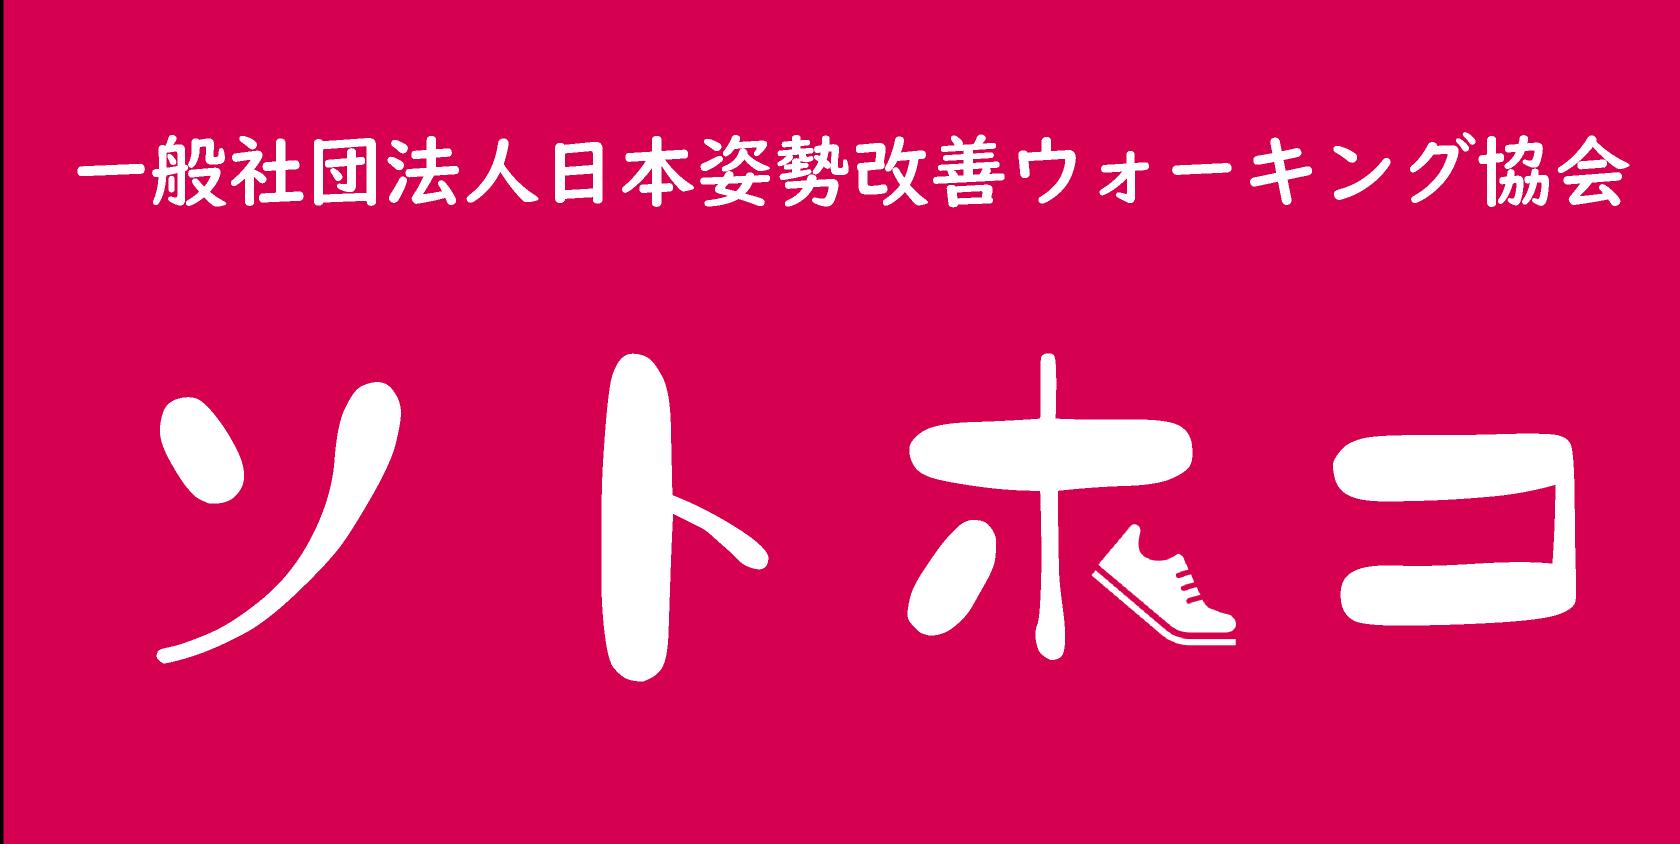 sohotoko_logo_002